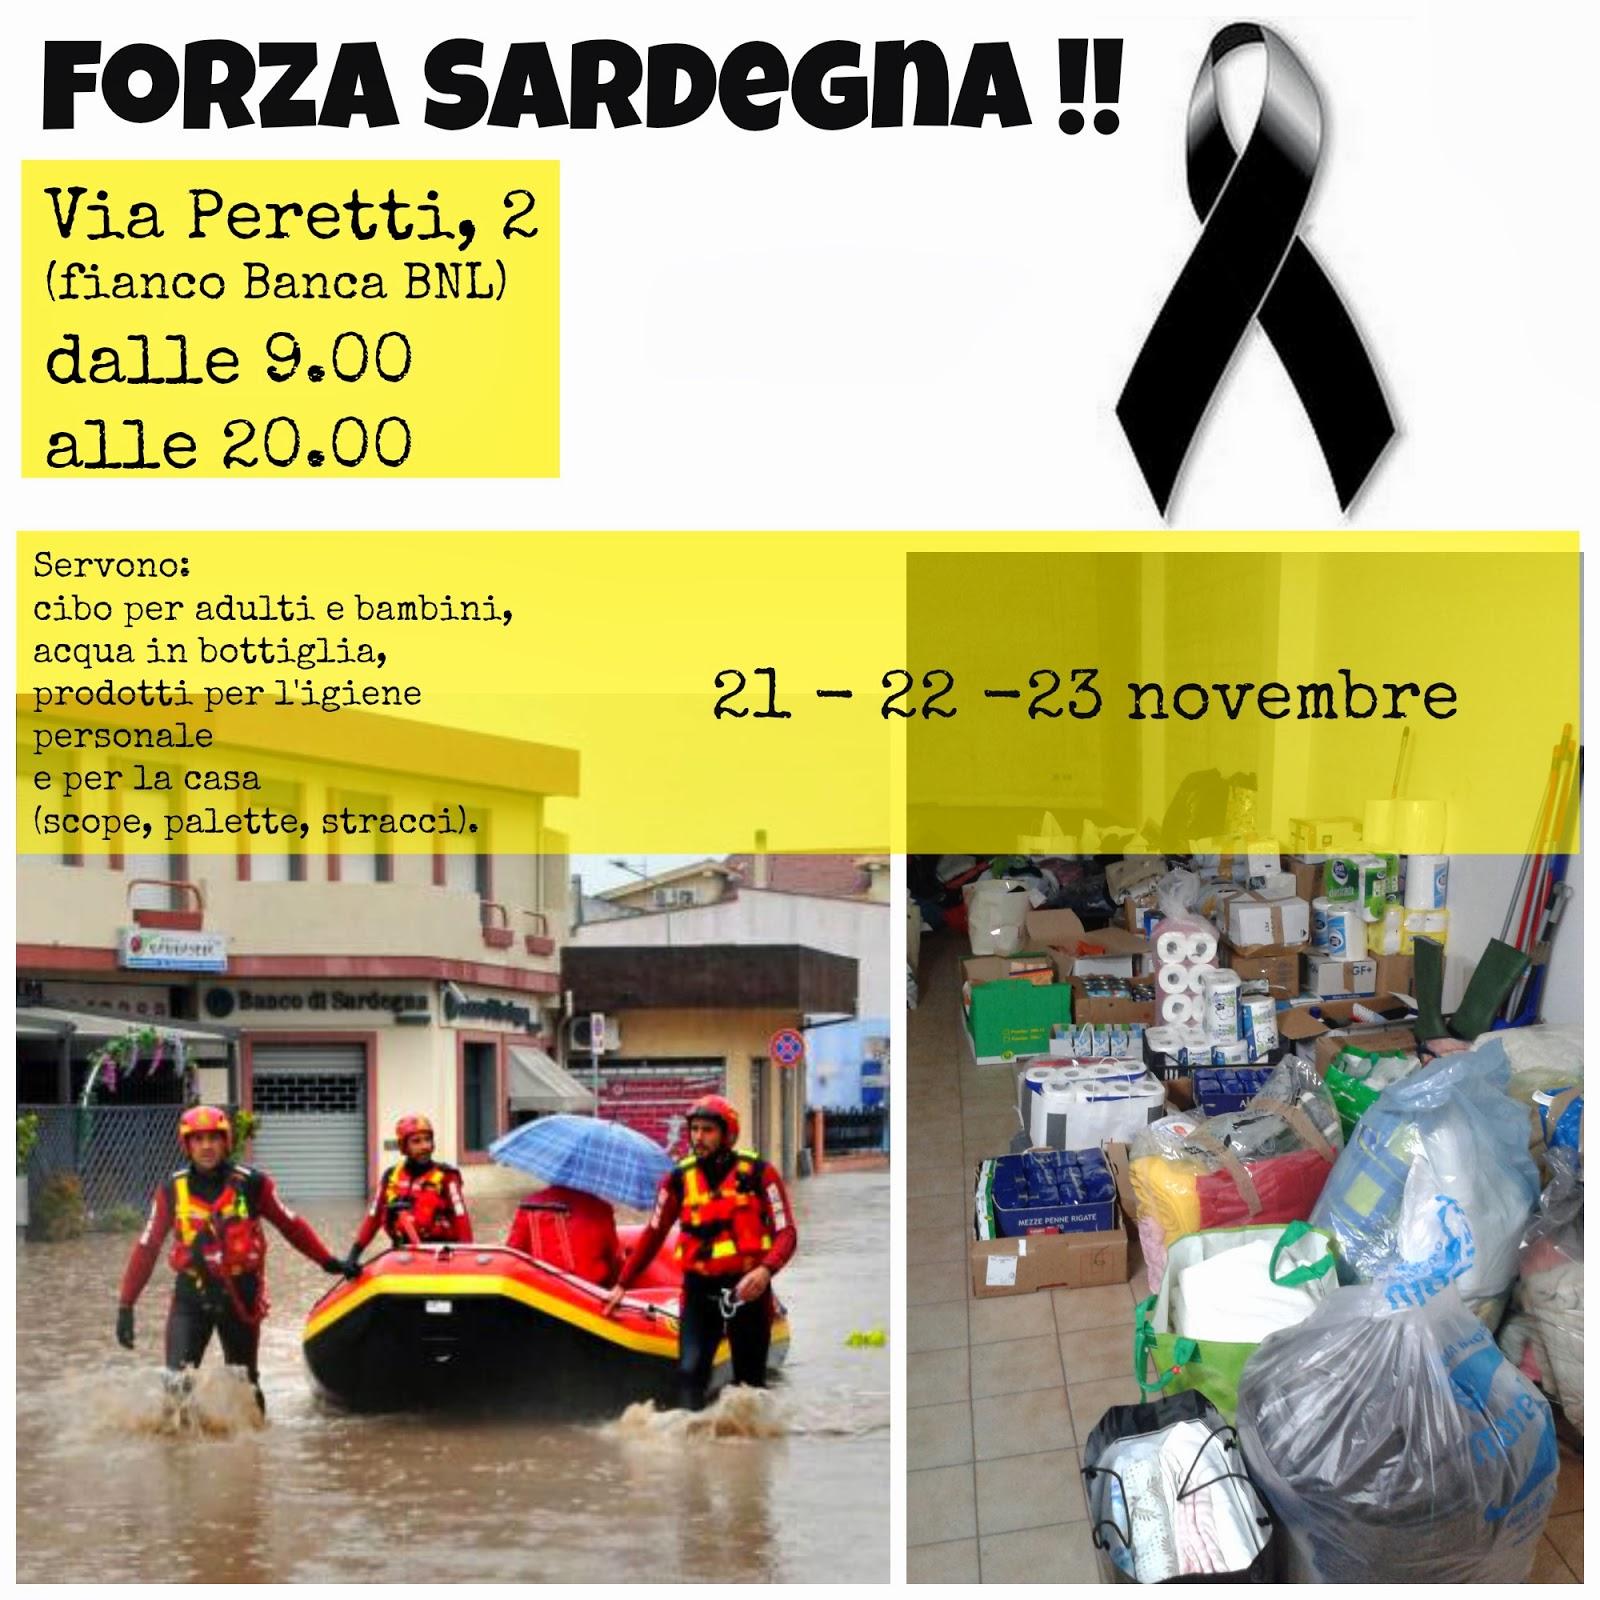 Forza Sardegna